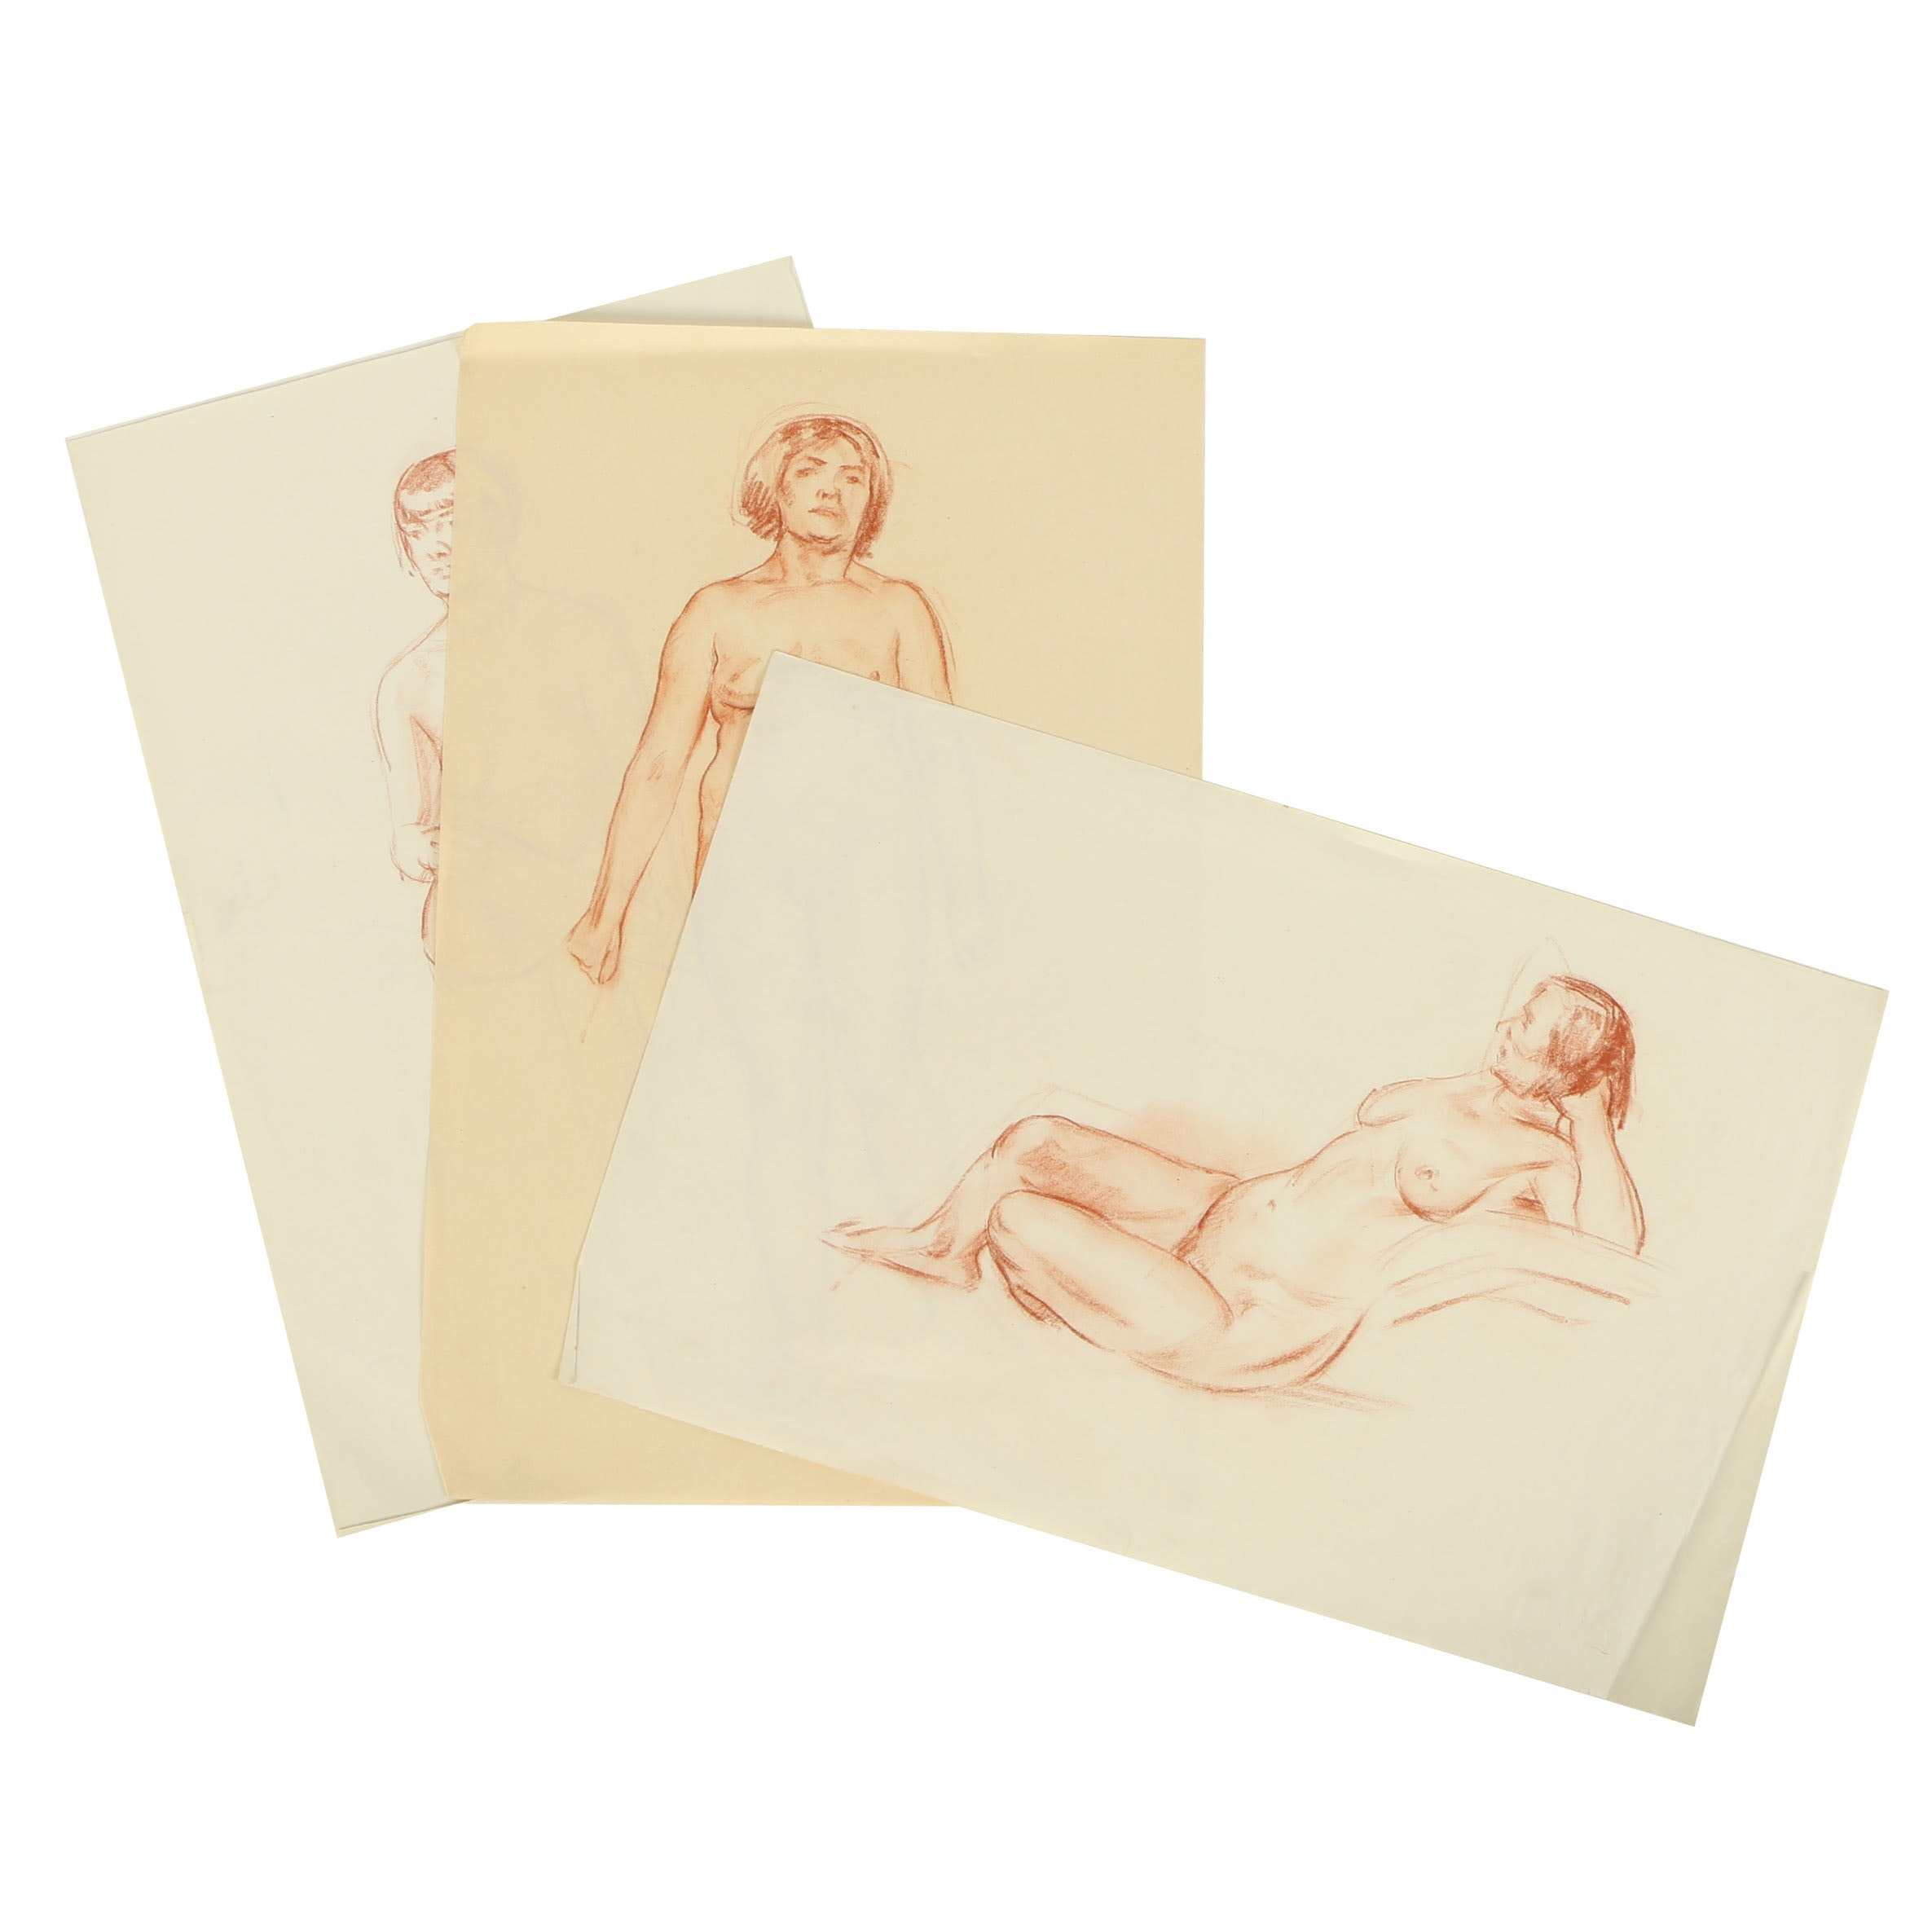 Carl Zimmerman Conté Crayon Sketches